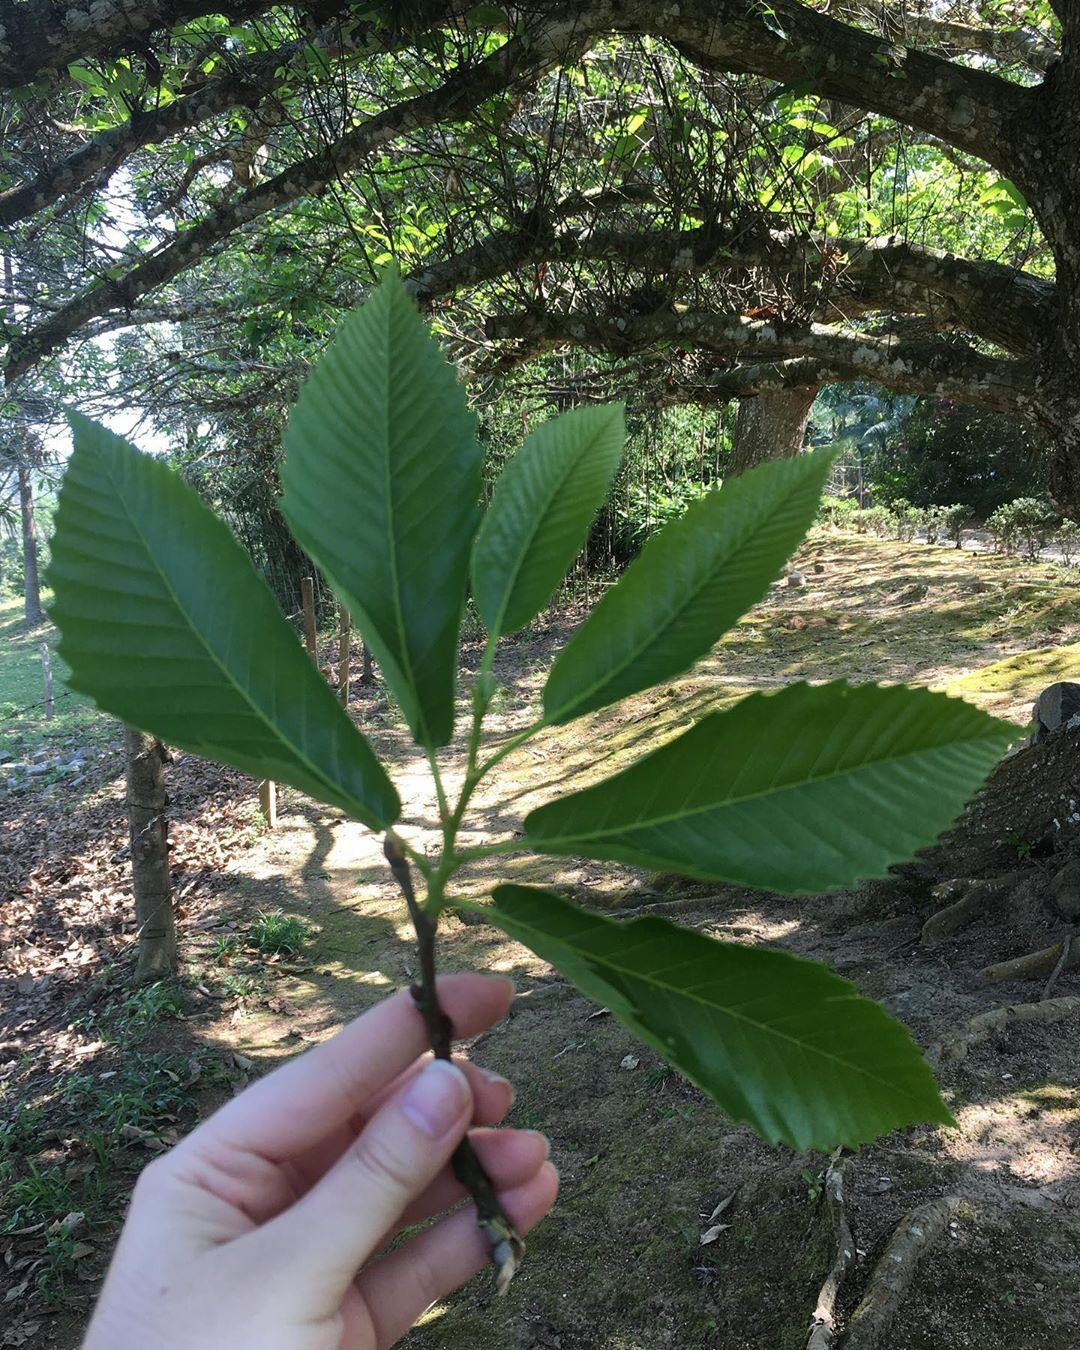 Castanea Sativa Nature Plants Trees Nofilter Plants Plant Leaves Garden